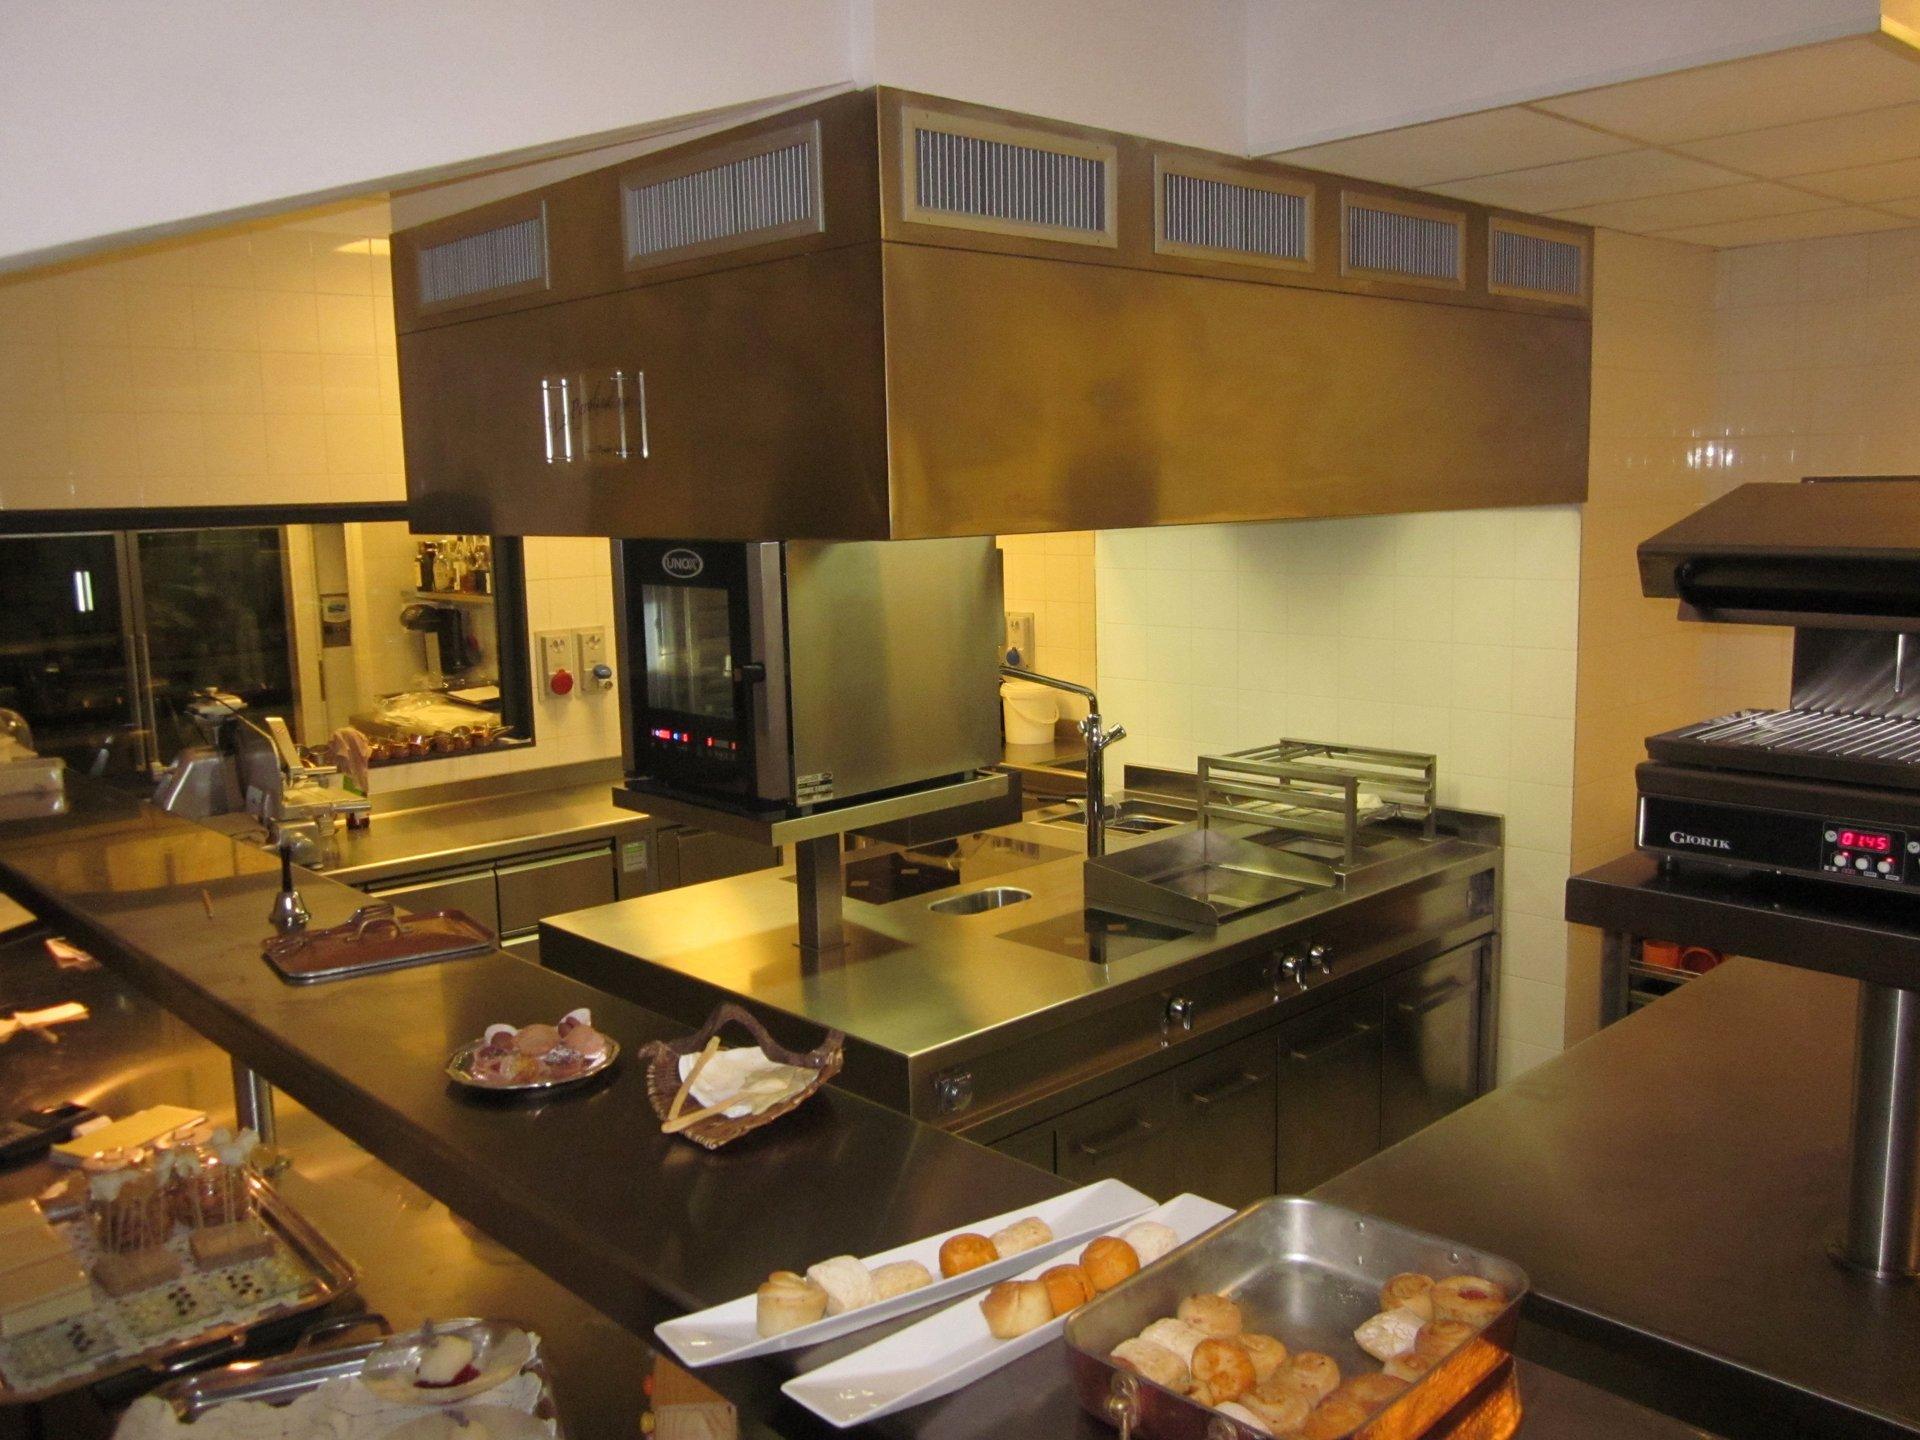 una cucina di un ristorante